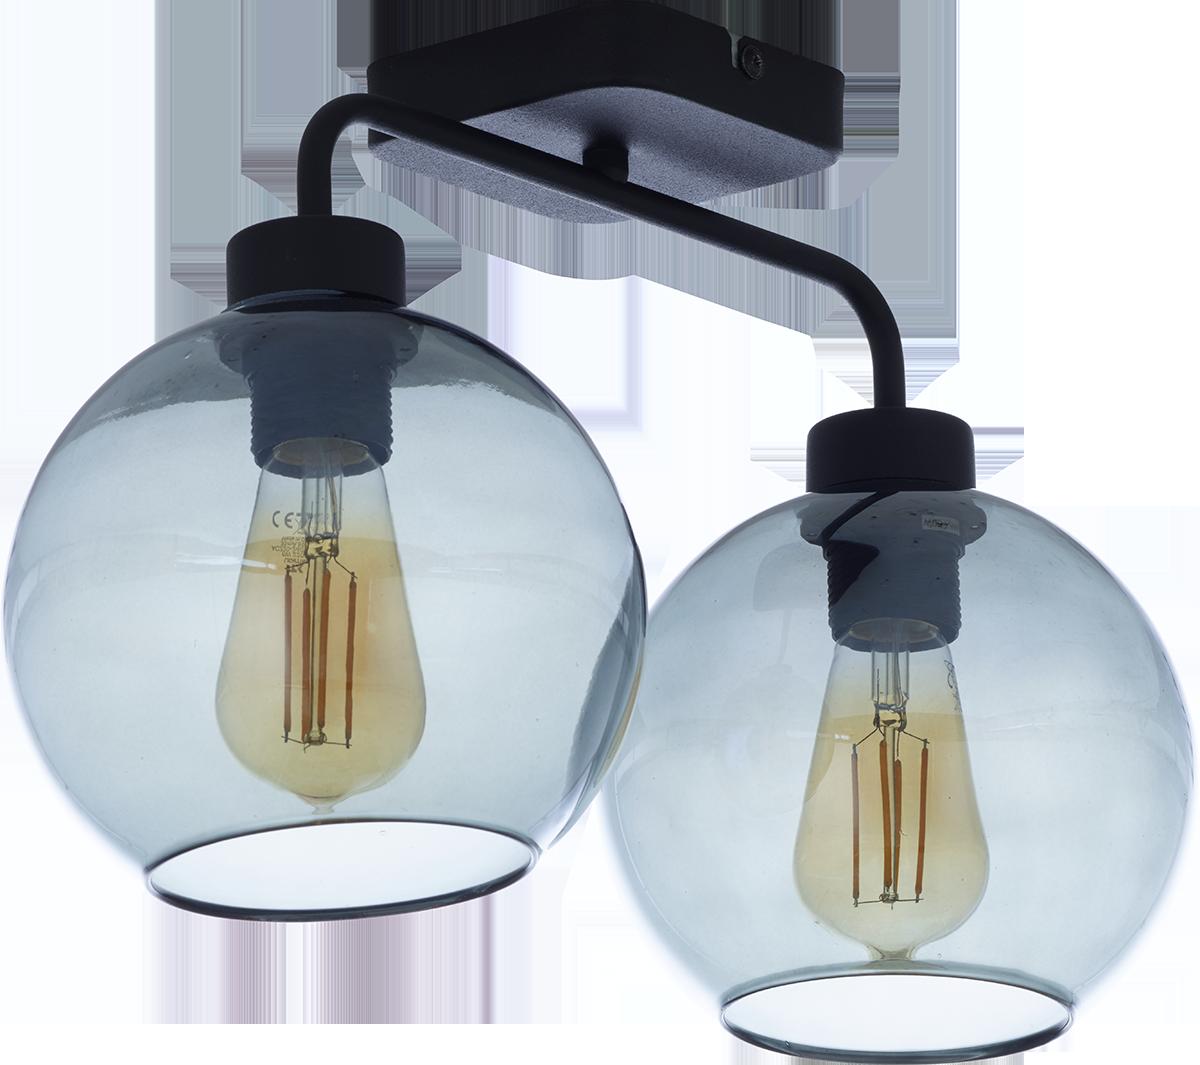 TK Lighting TK-4021 Bari mennyezeti lámpa